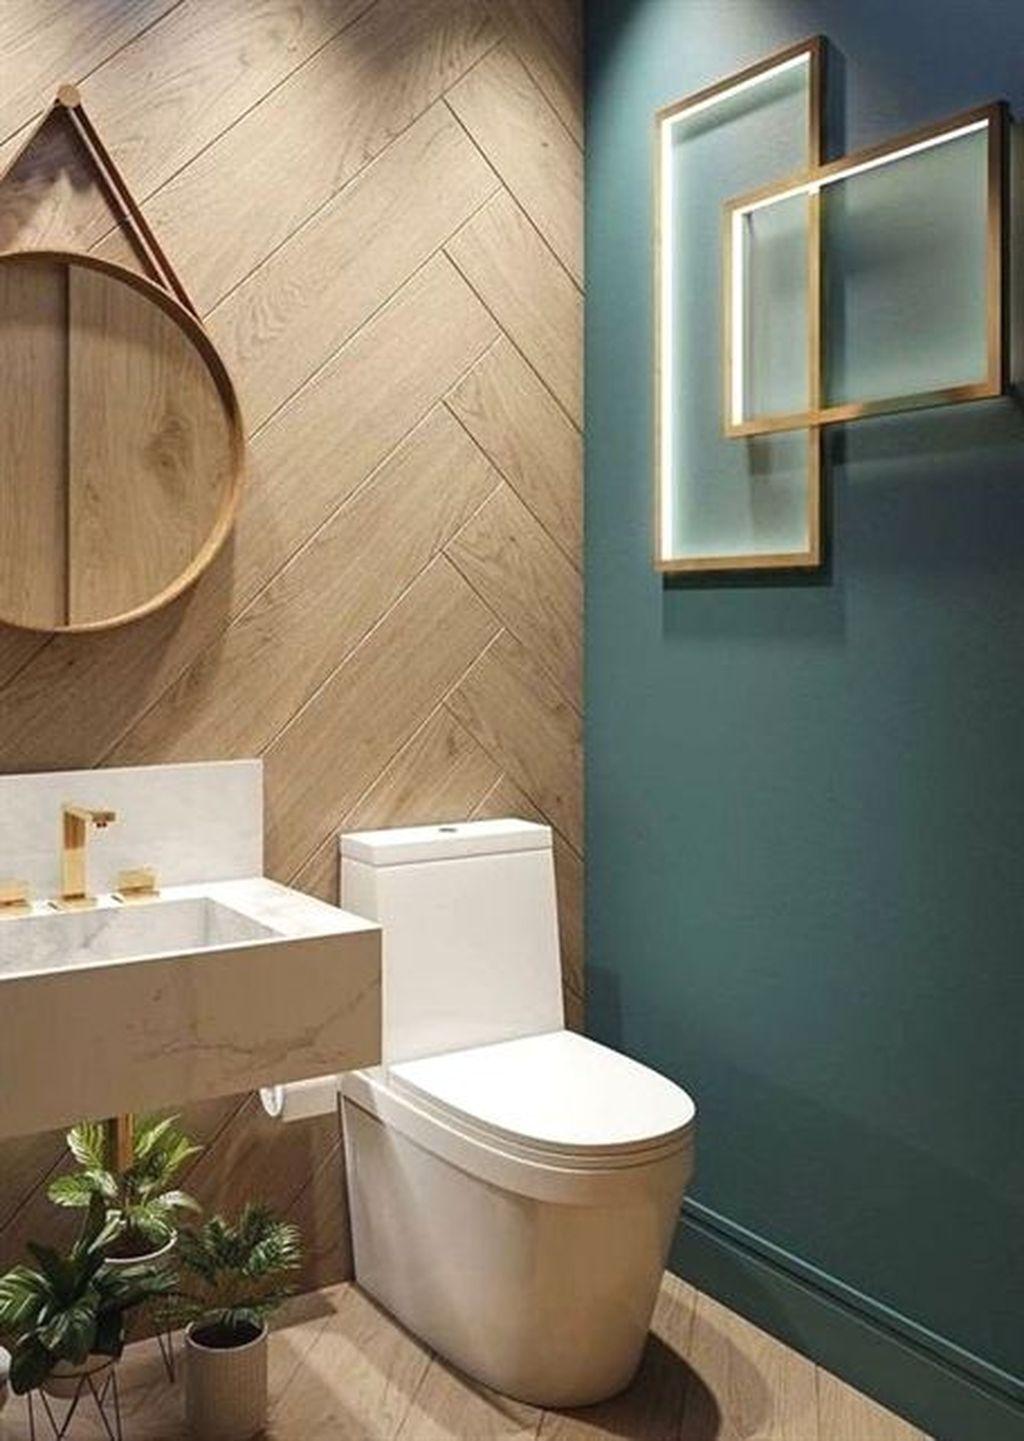 Unusual Bathroom Design Ideas You Need To Know 37